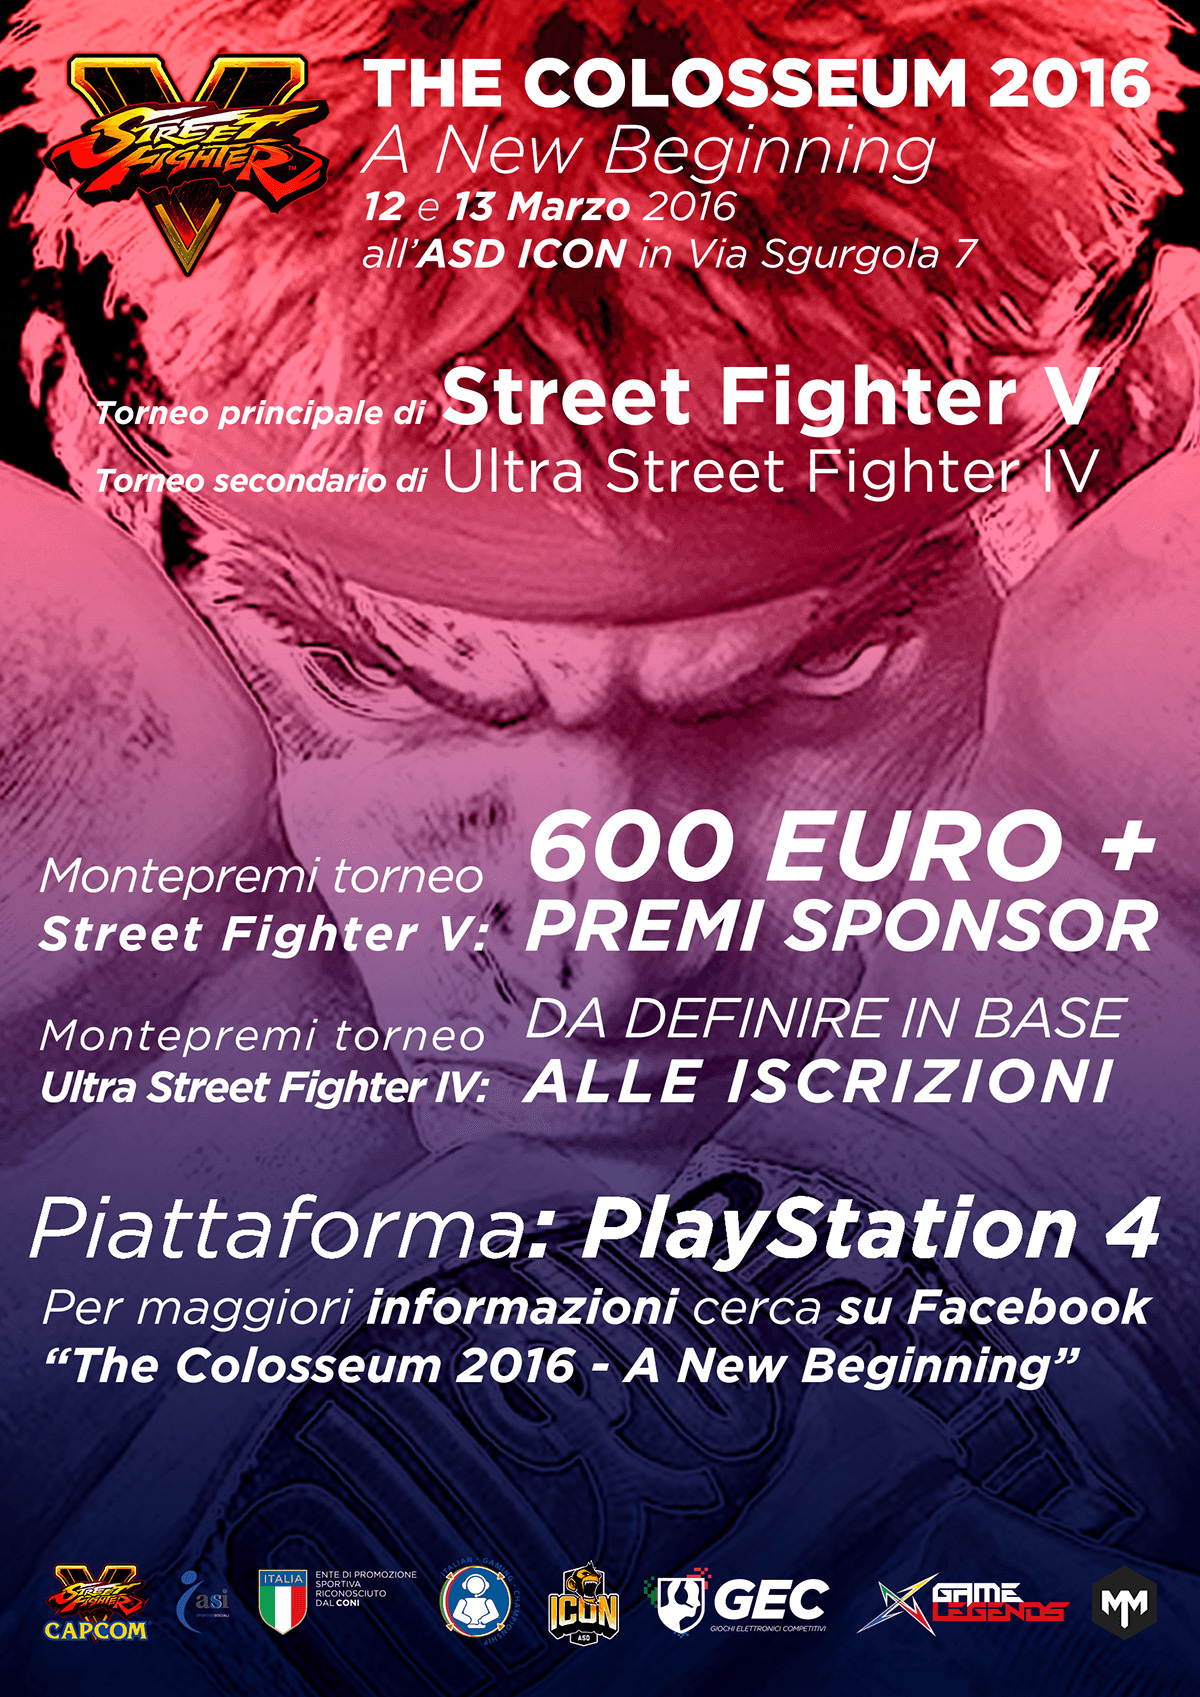 The Colosseum 2016 - A New Beginning - primo torneo italiano di Street Fighter V